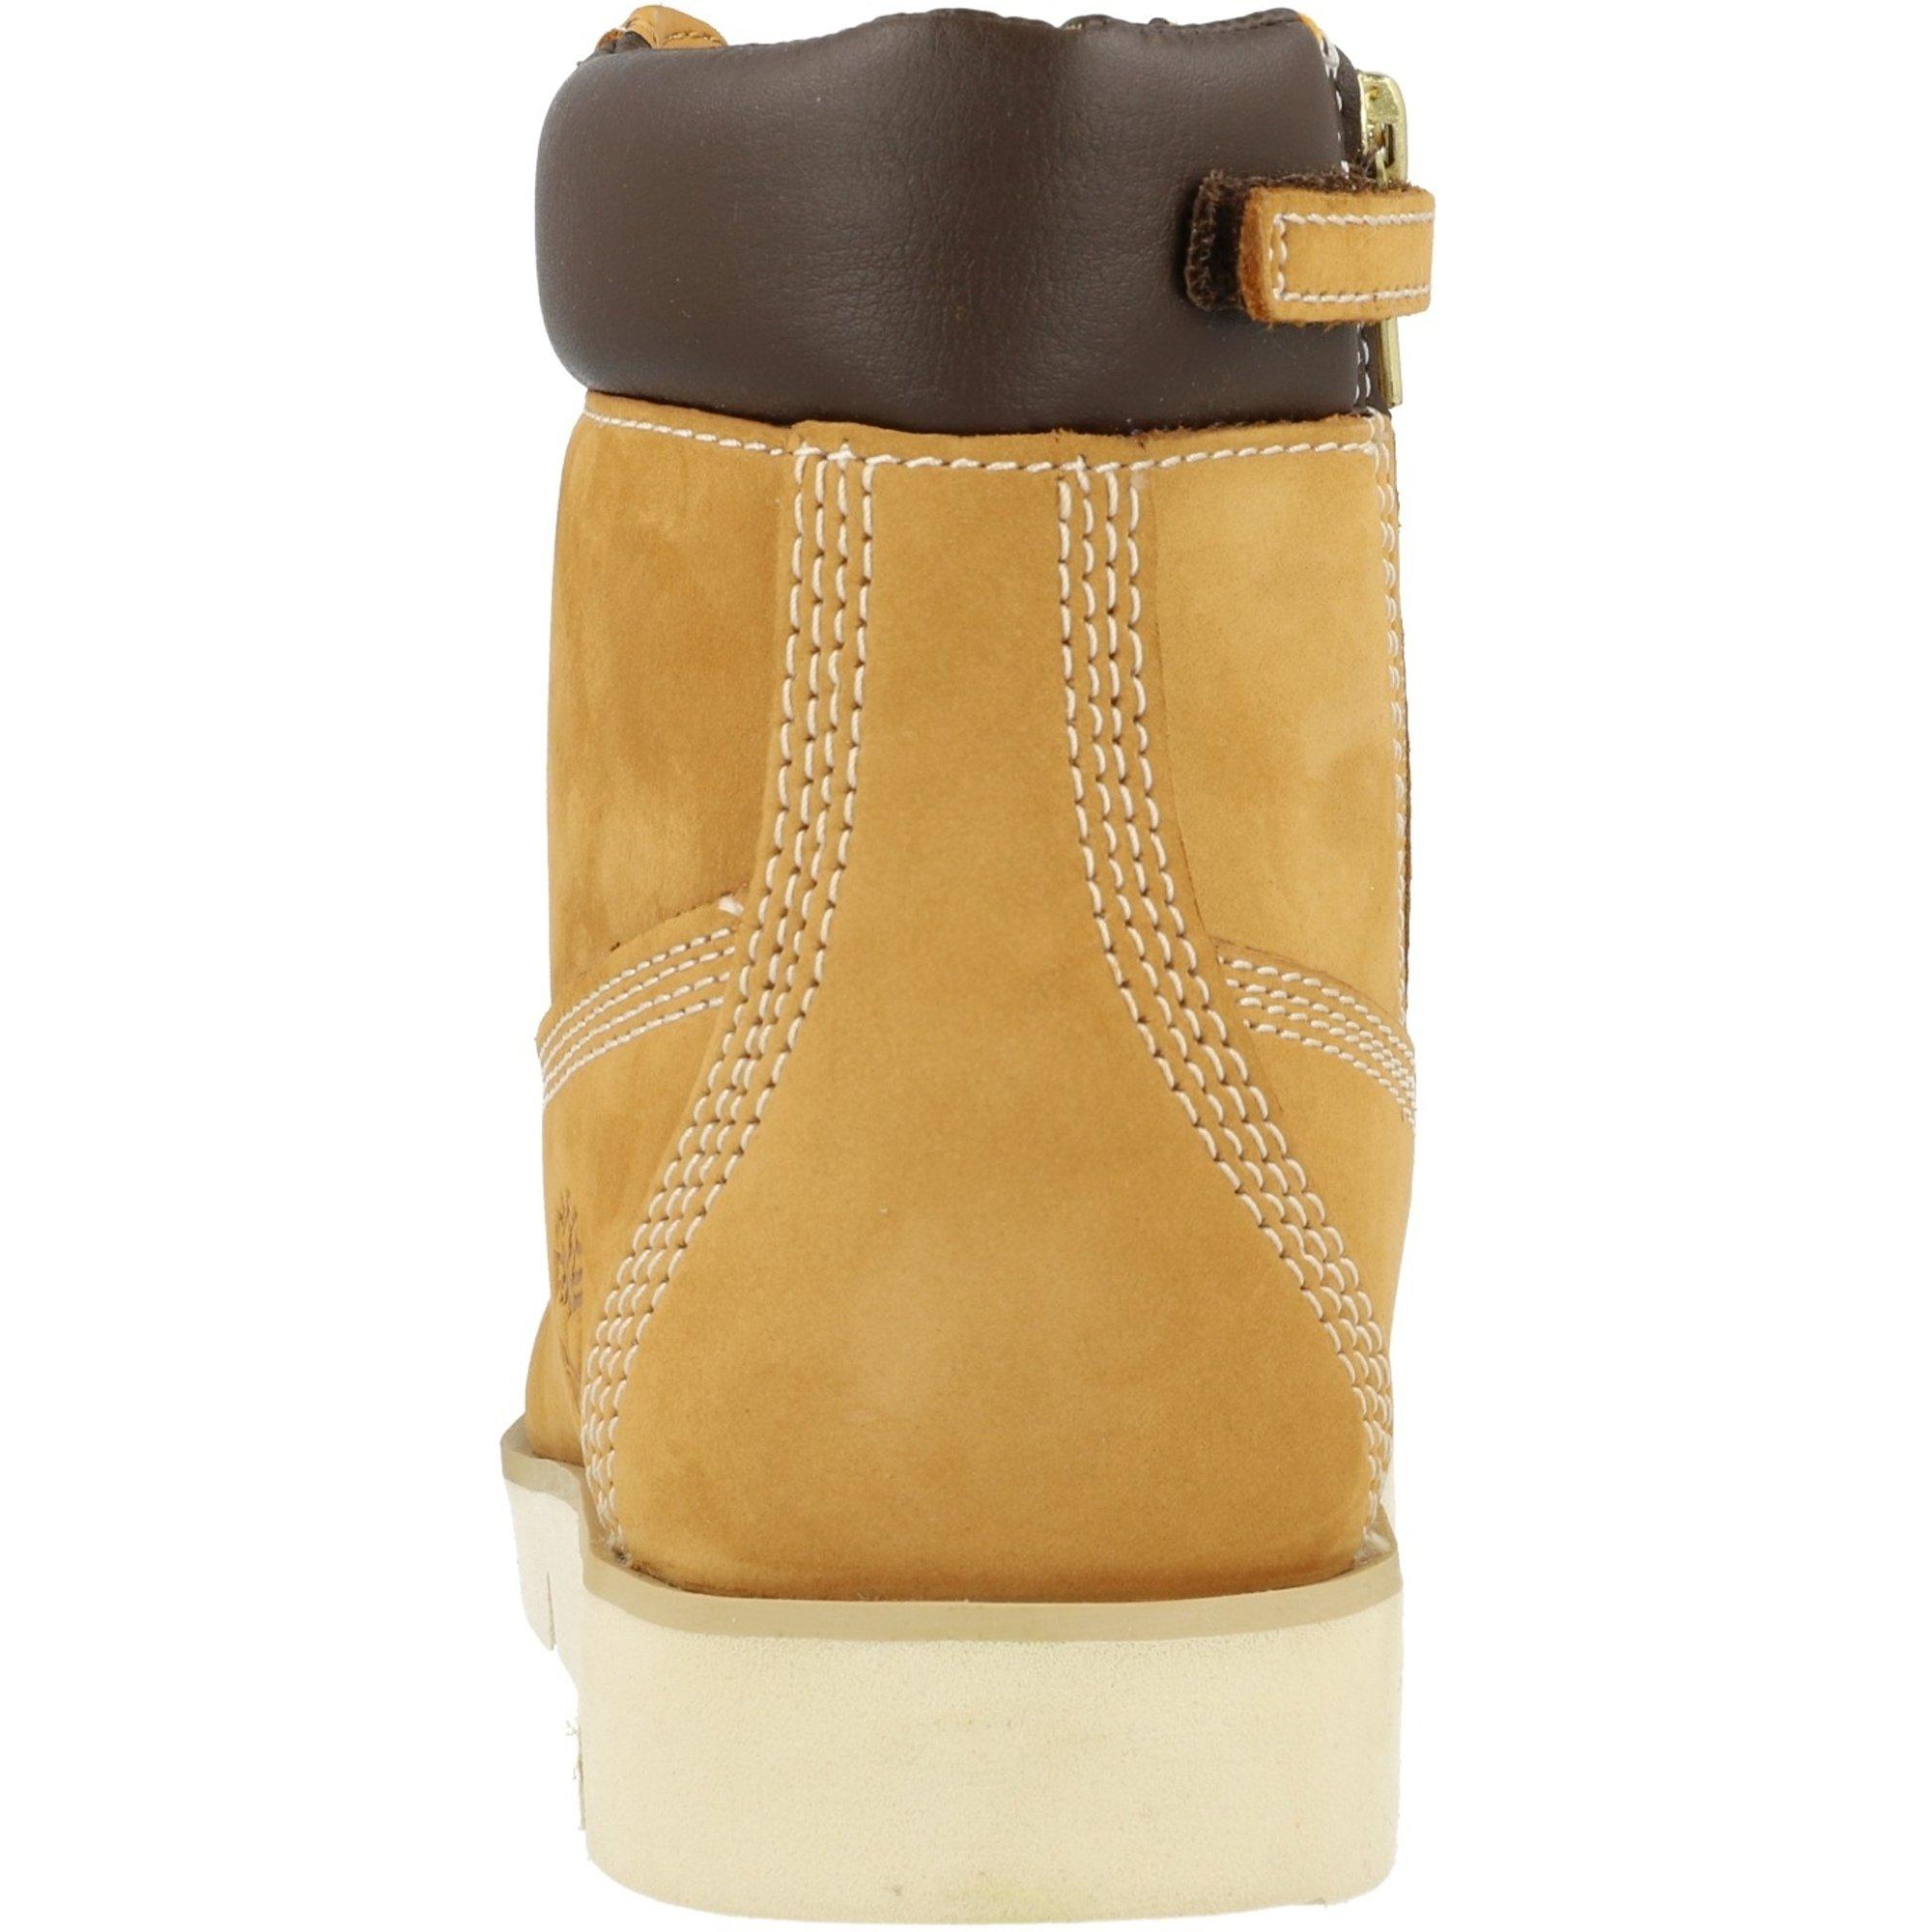 39 Tirmberland Radford 6 In Side Zip Junior Boots Nubukleder Wheat Gr